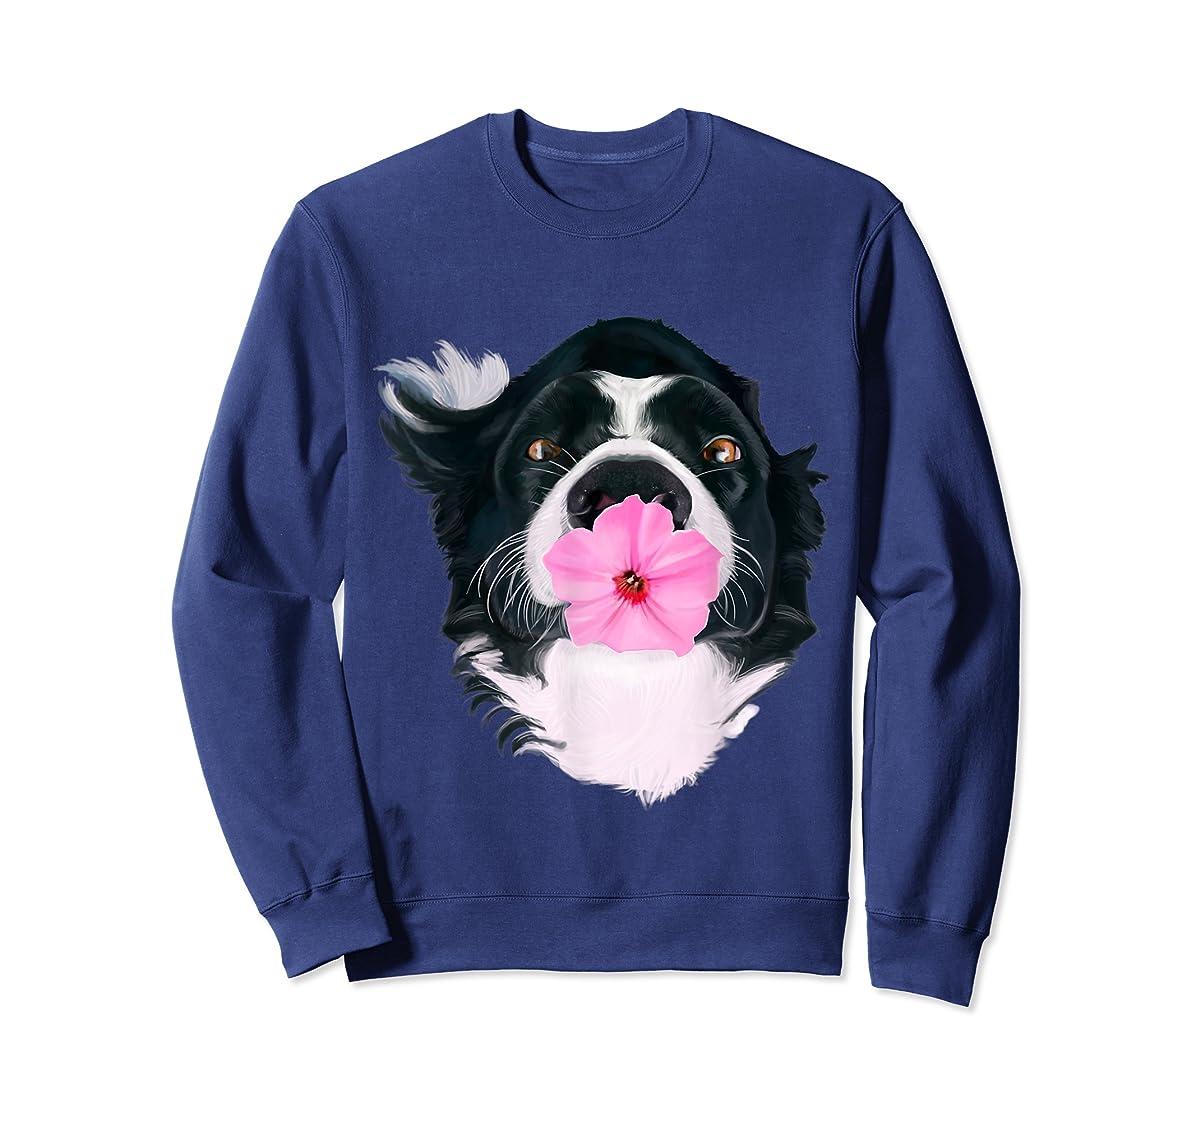 Border Collie Sweet Dog T-Shirt Dogs Tee Shirt Gifts-Sweatshirt-Navy